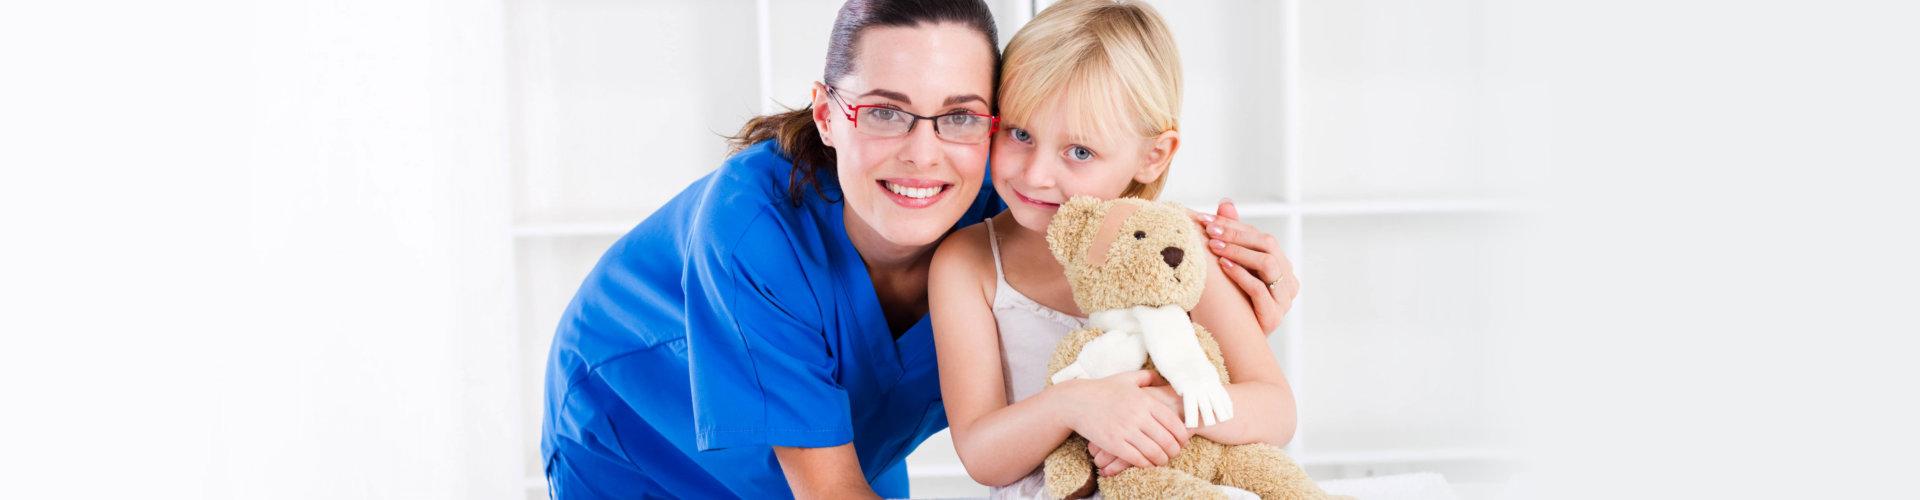 pediatrician hugging young girl holding a bear